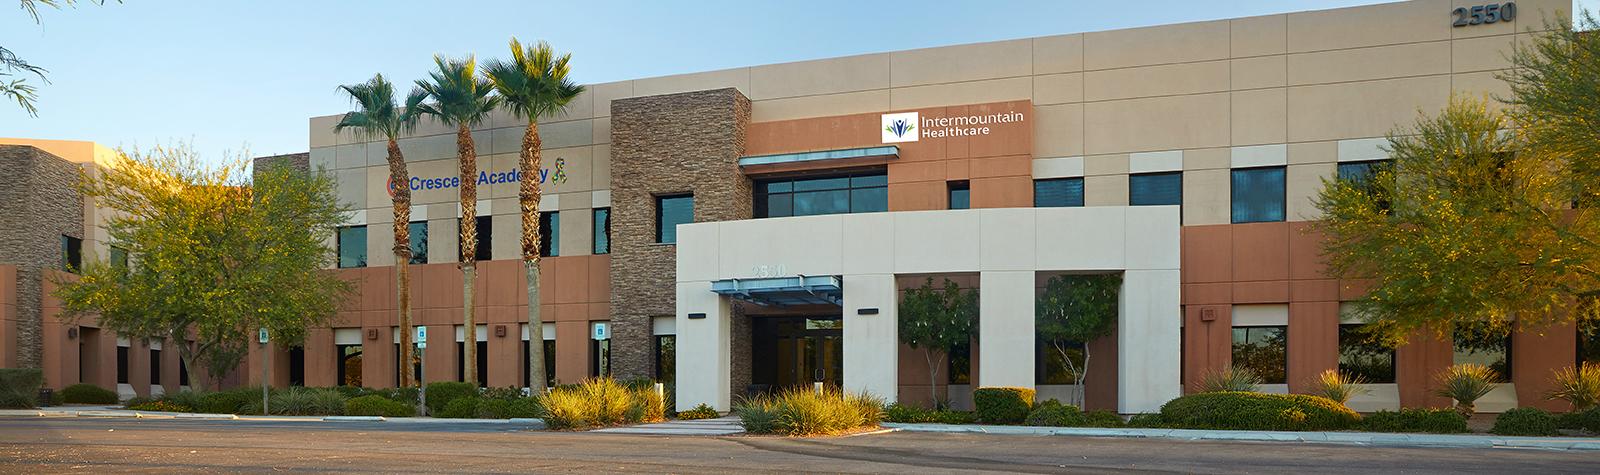 Intermountain Healthcare Debuts Nature Park myGeneration Senior Clinic